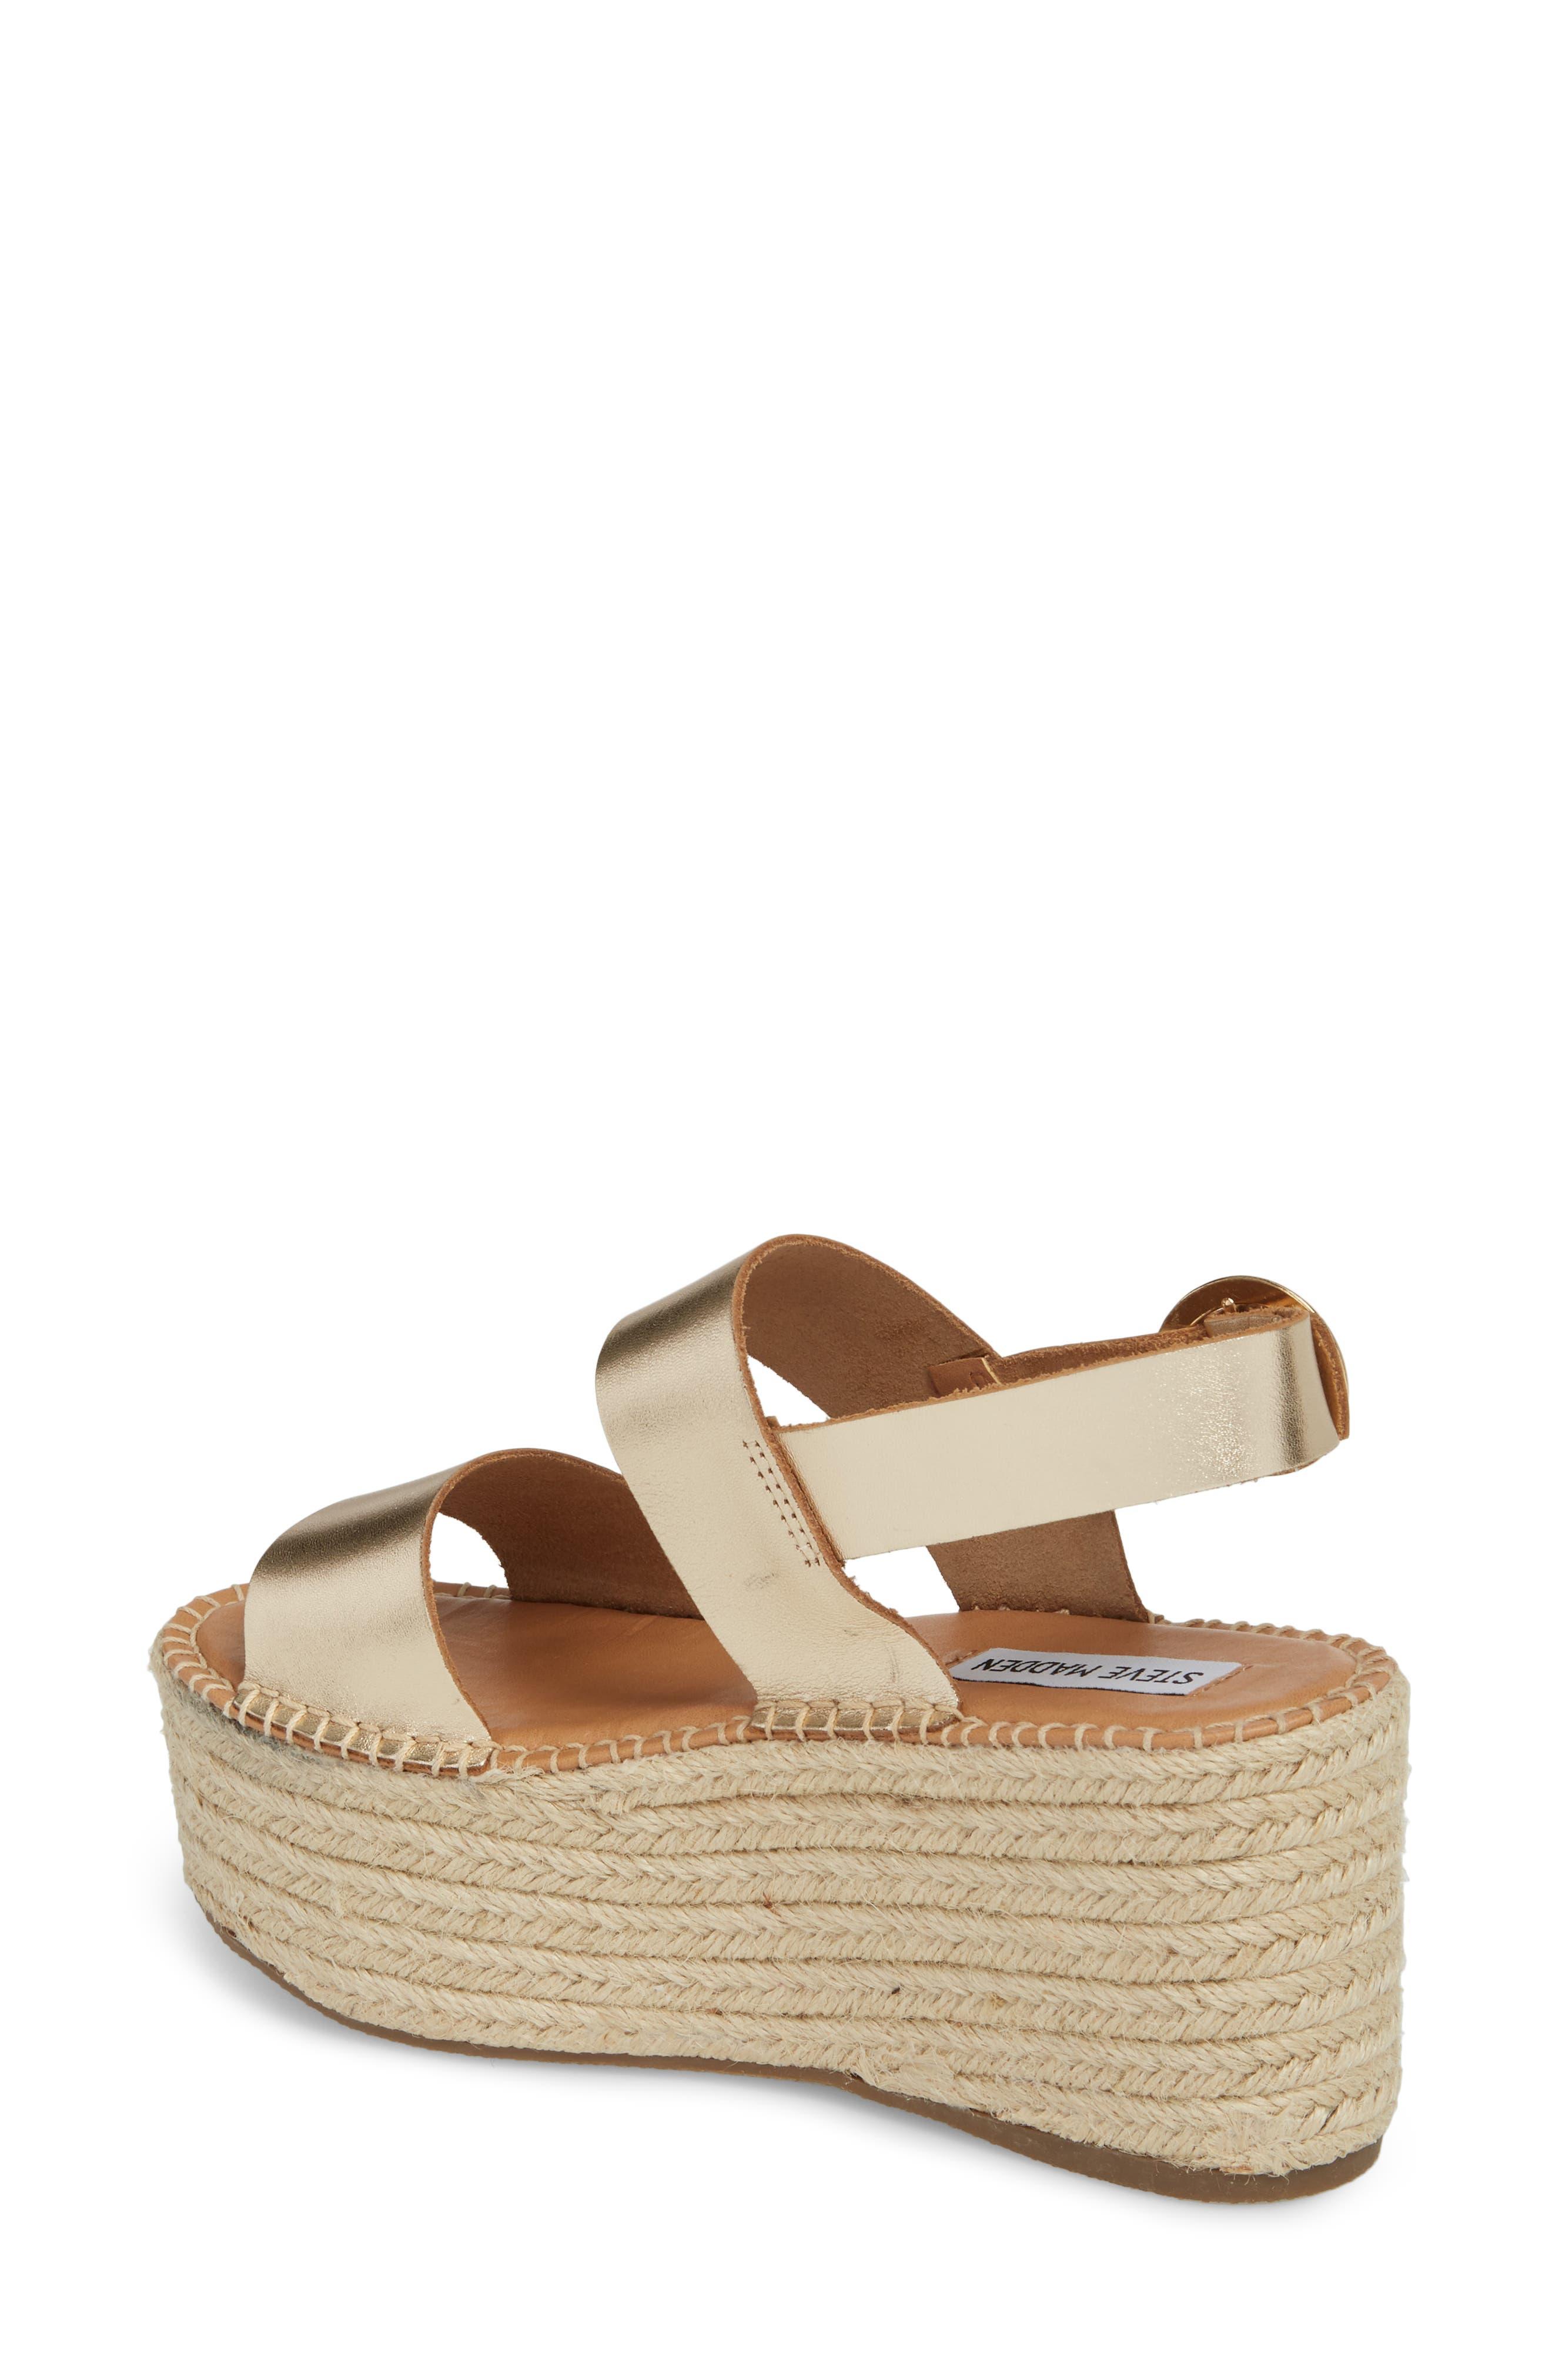 Cali Espadrille Platform Sandal,                             Alternate thumbnail 6, color,